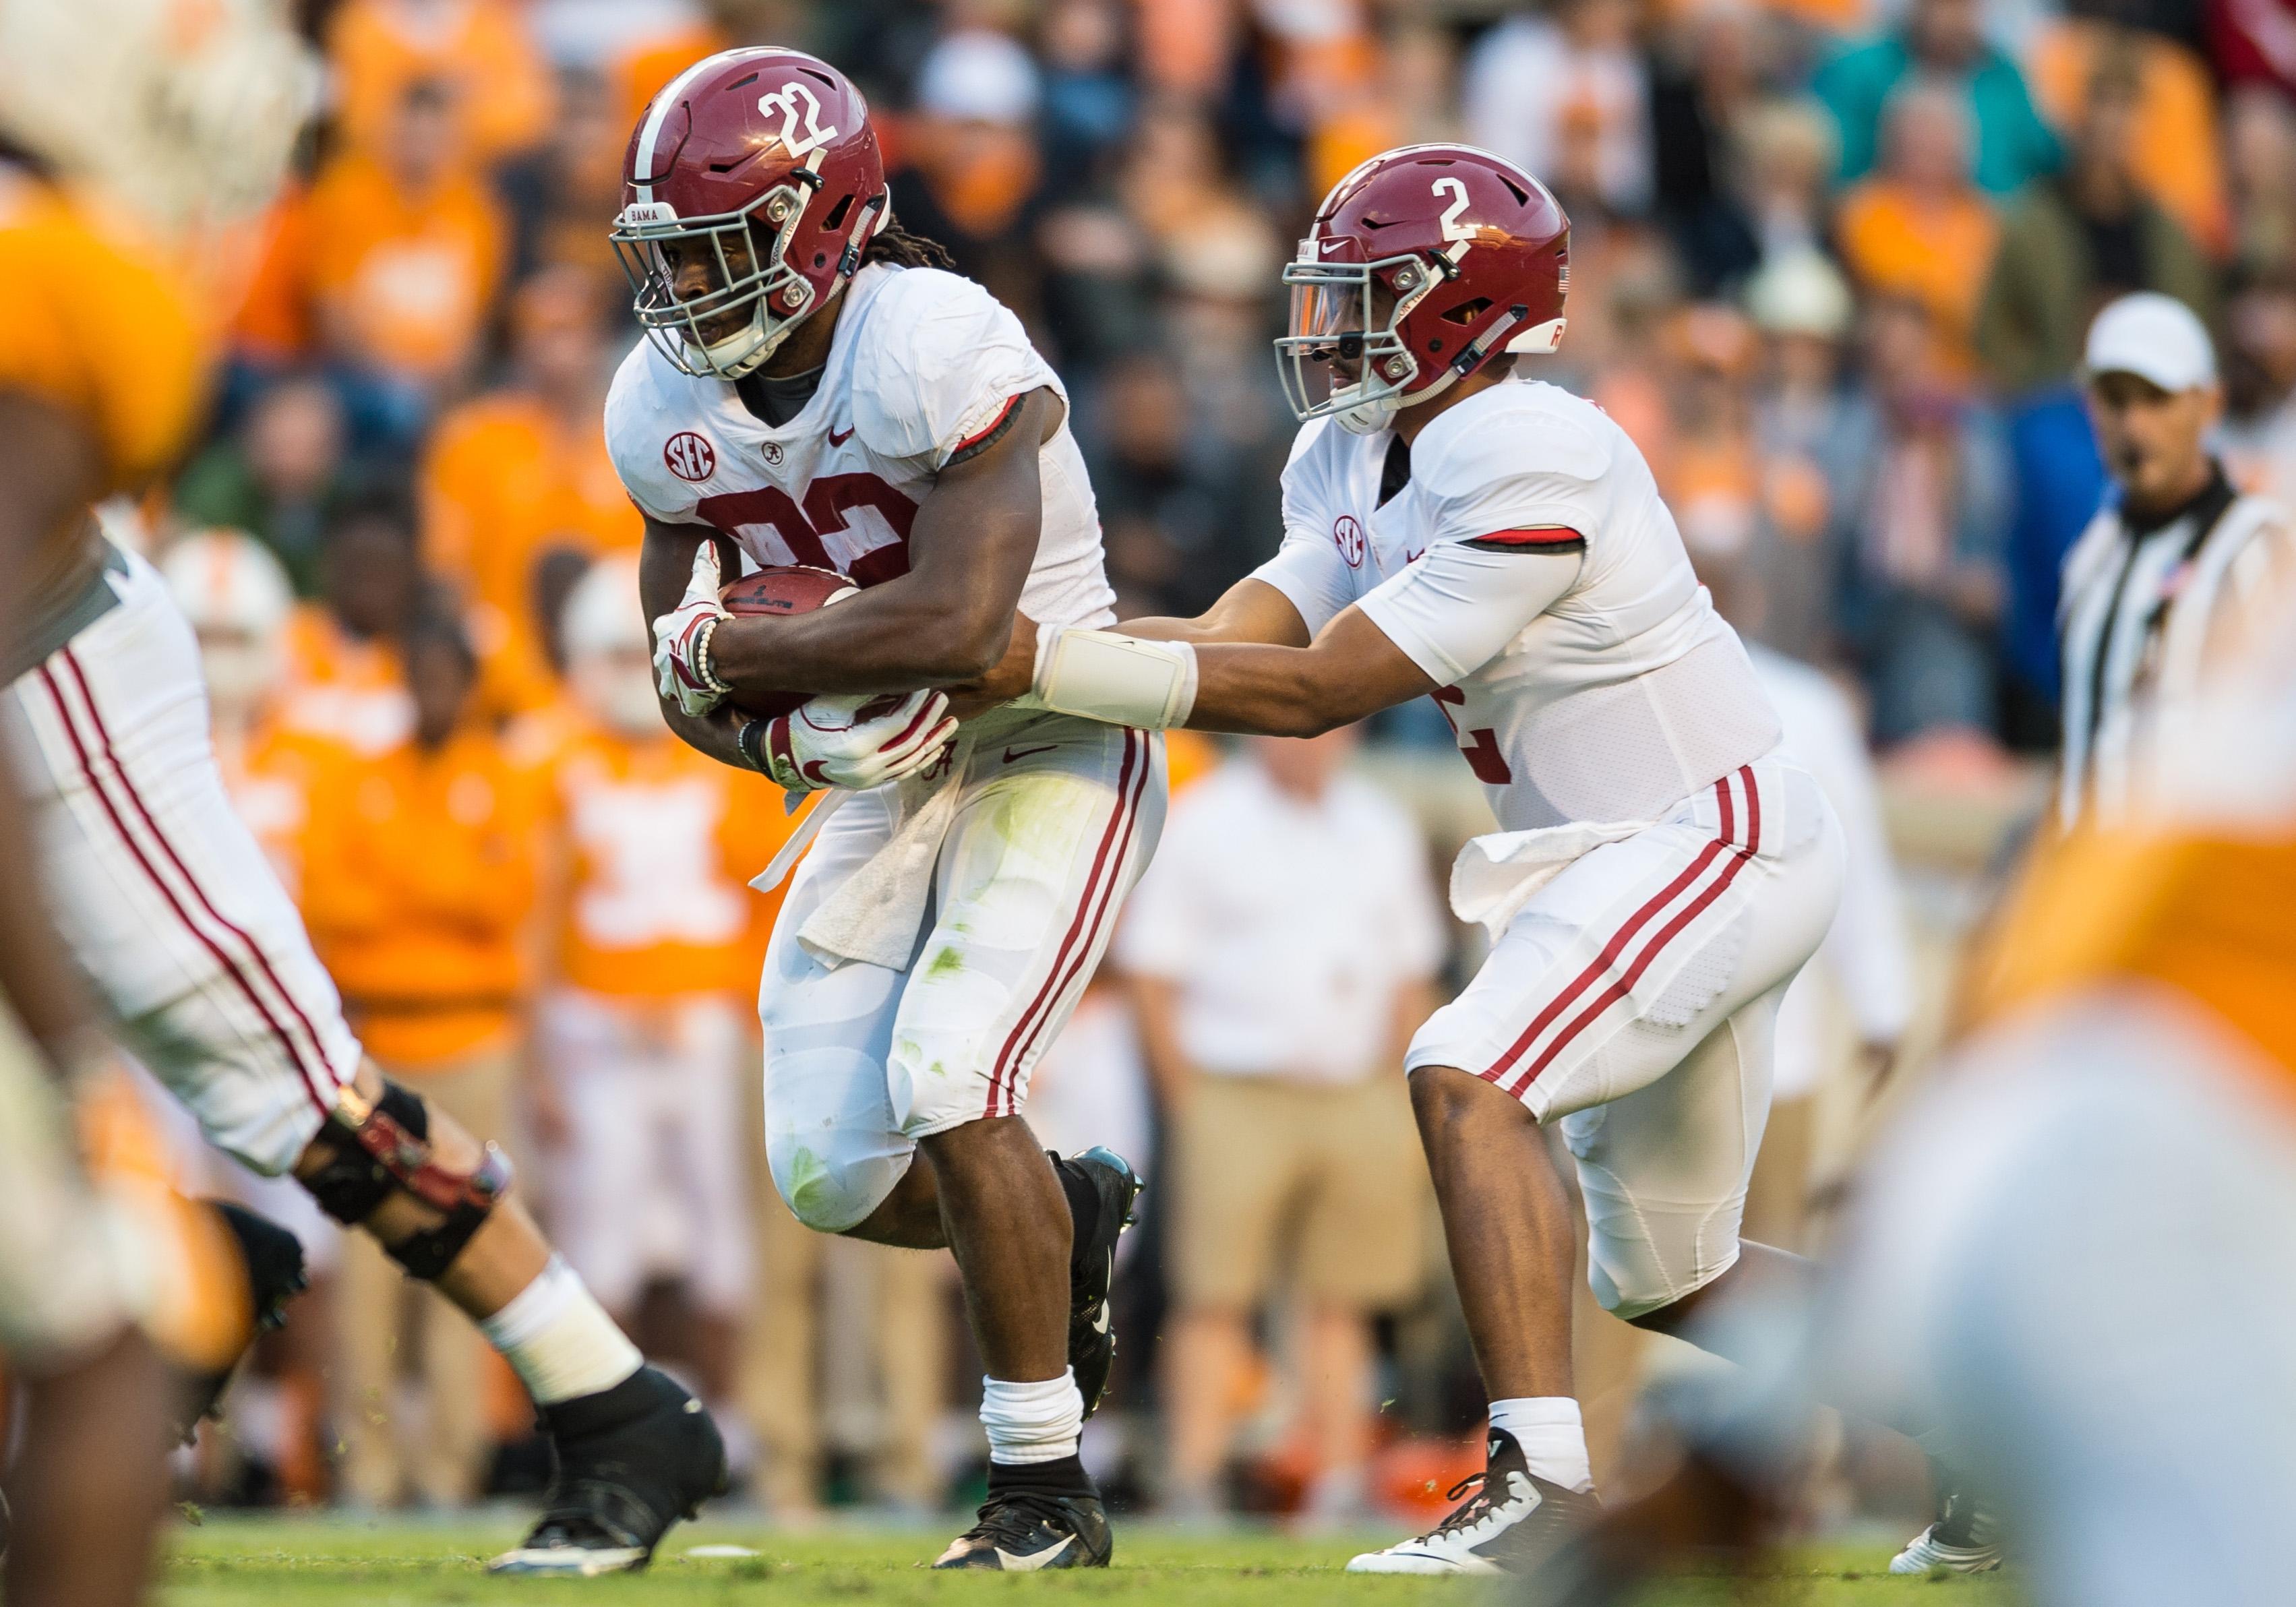 069a5b64 ... Football Playoff rankings predict the semifinals. Bryan Lynn | USA  Today Sports Images Alabama football